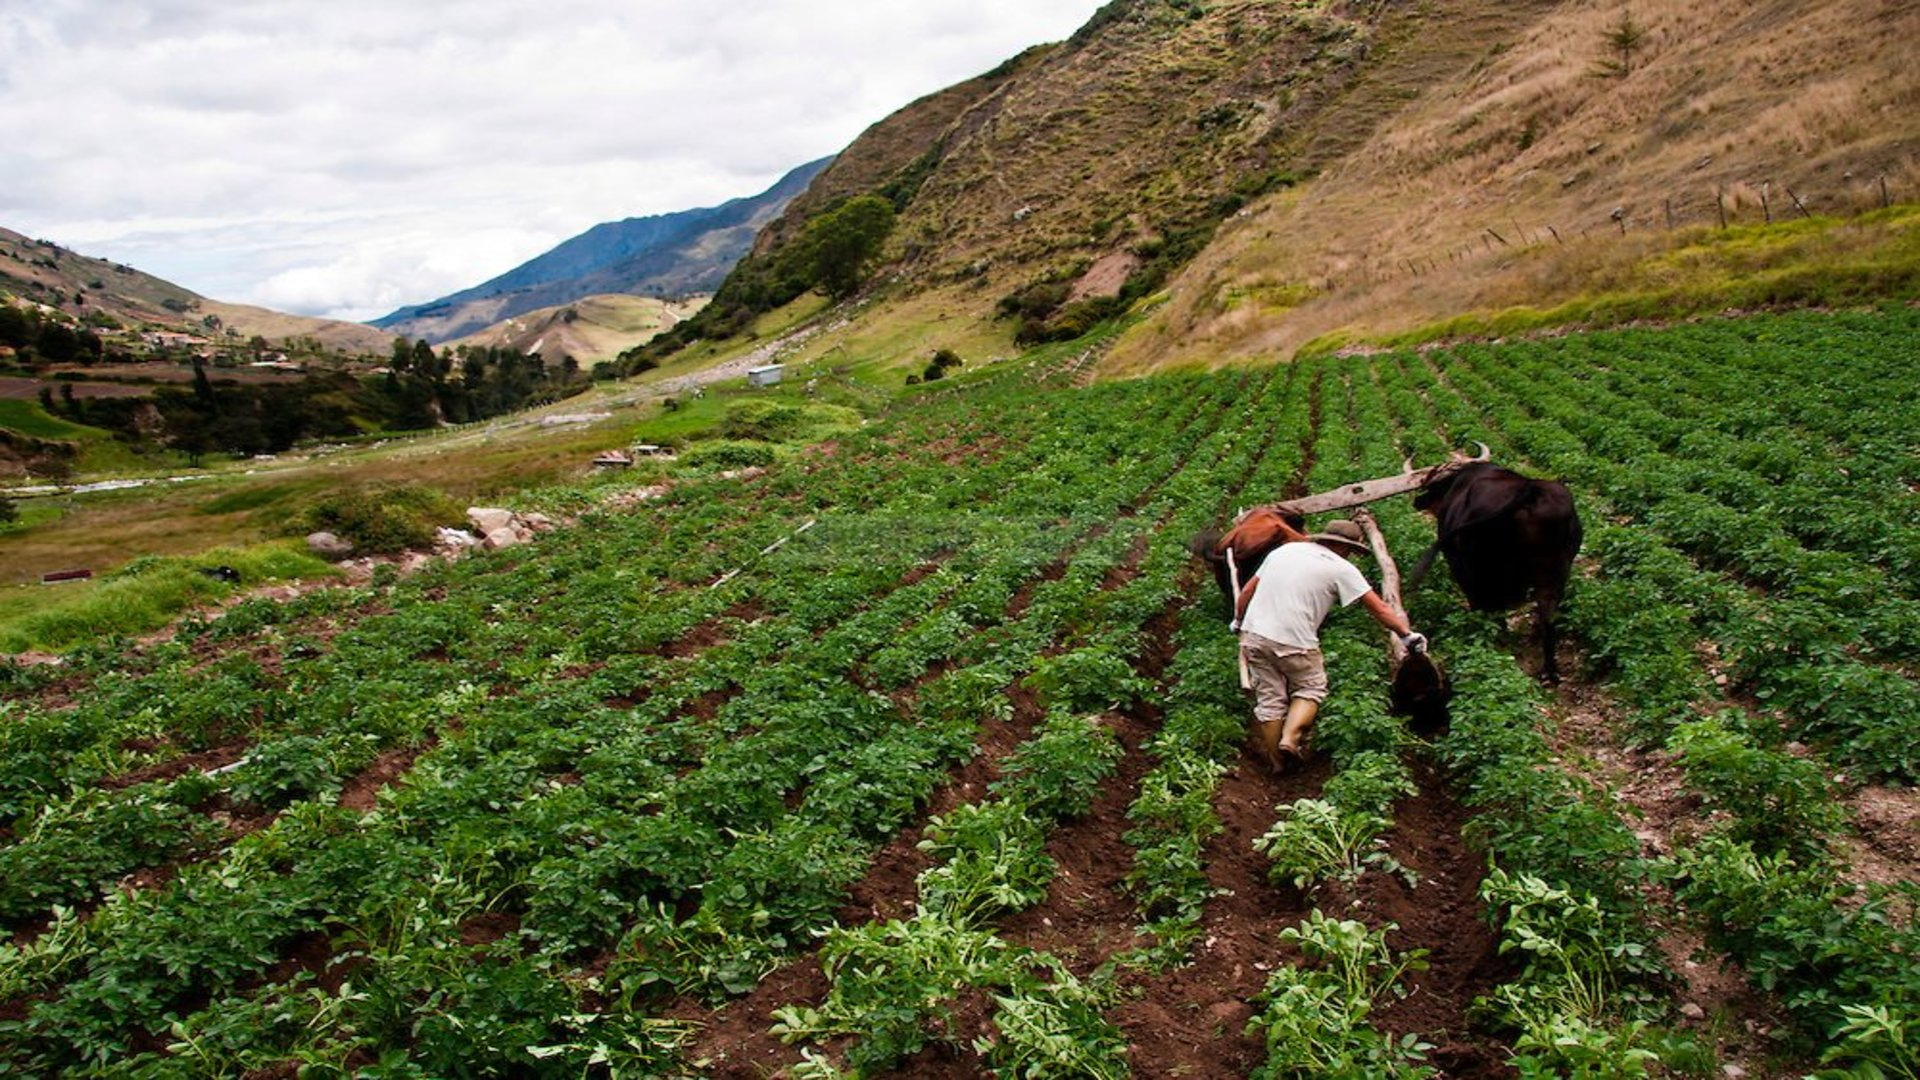 20.000 toneladas de hortalizas estarían en riesgo por falta de gasoil